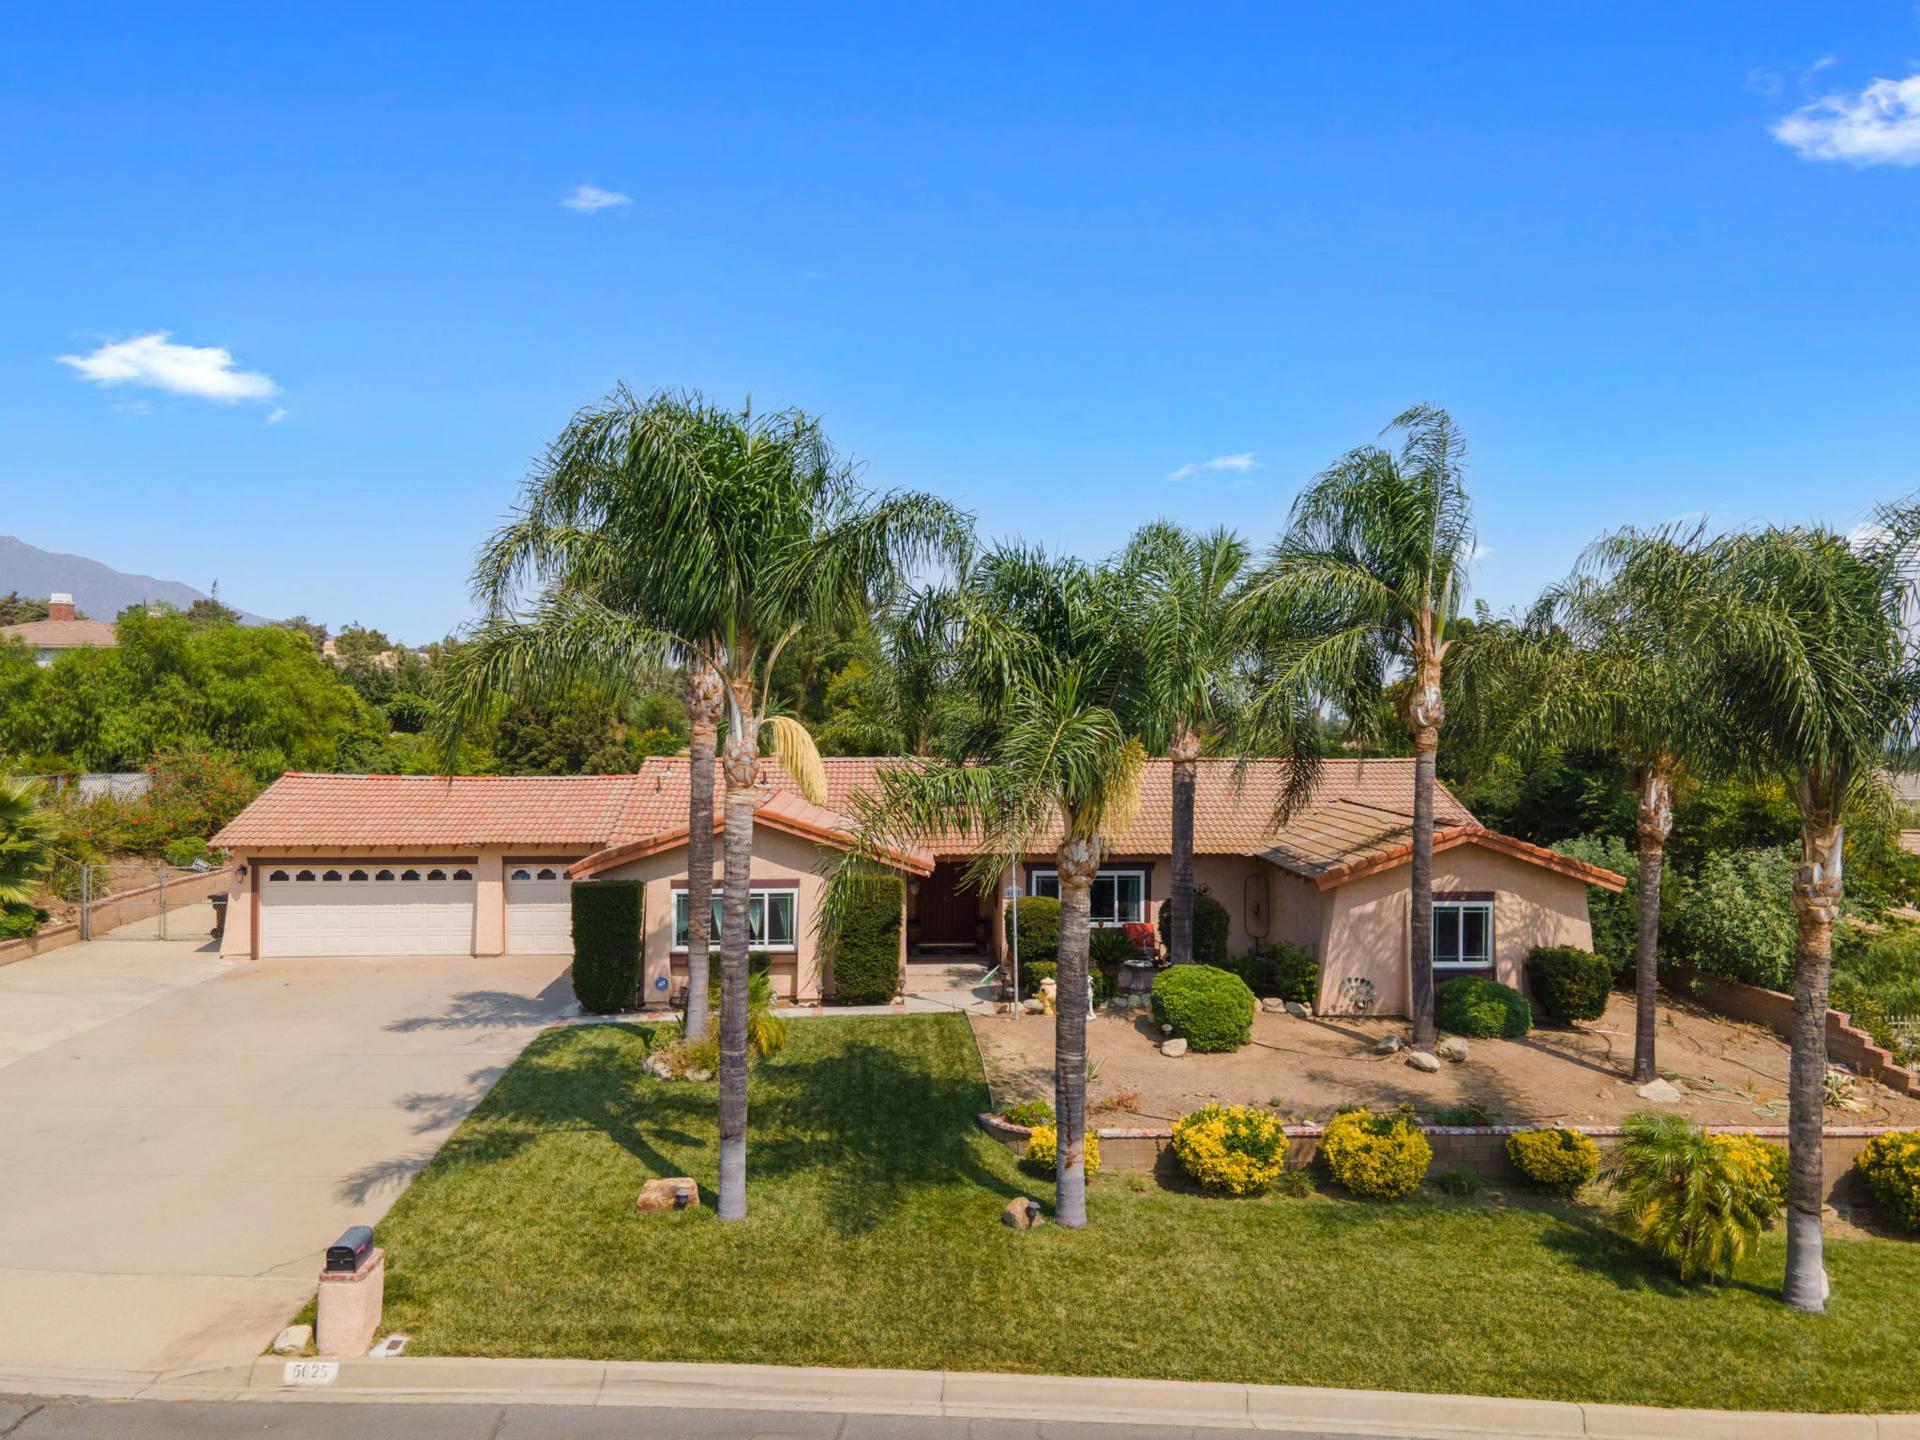 5625 Klusman Ave, Rancho Cucamonga, CA 91737, USA